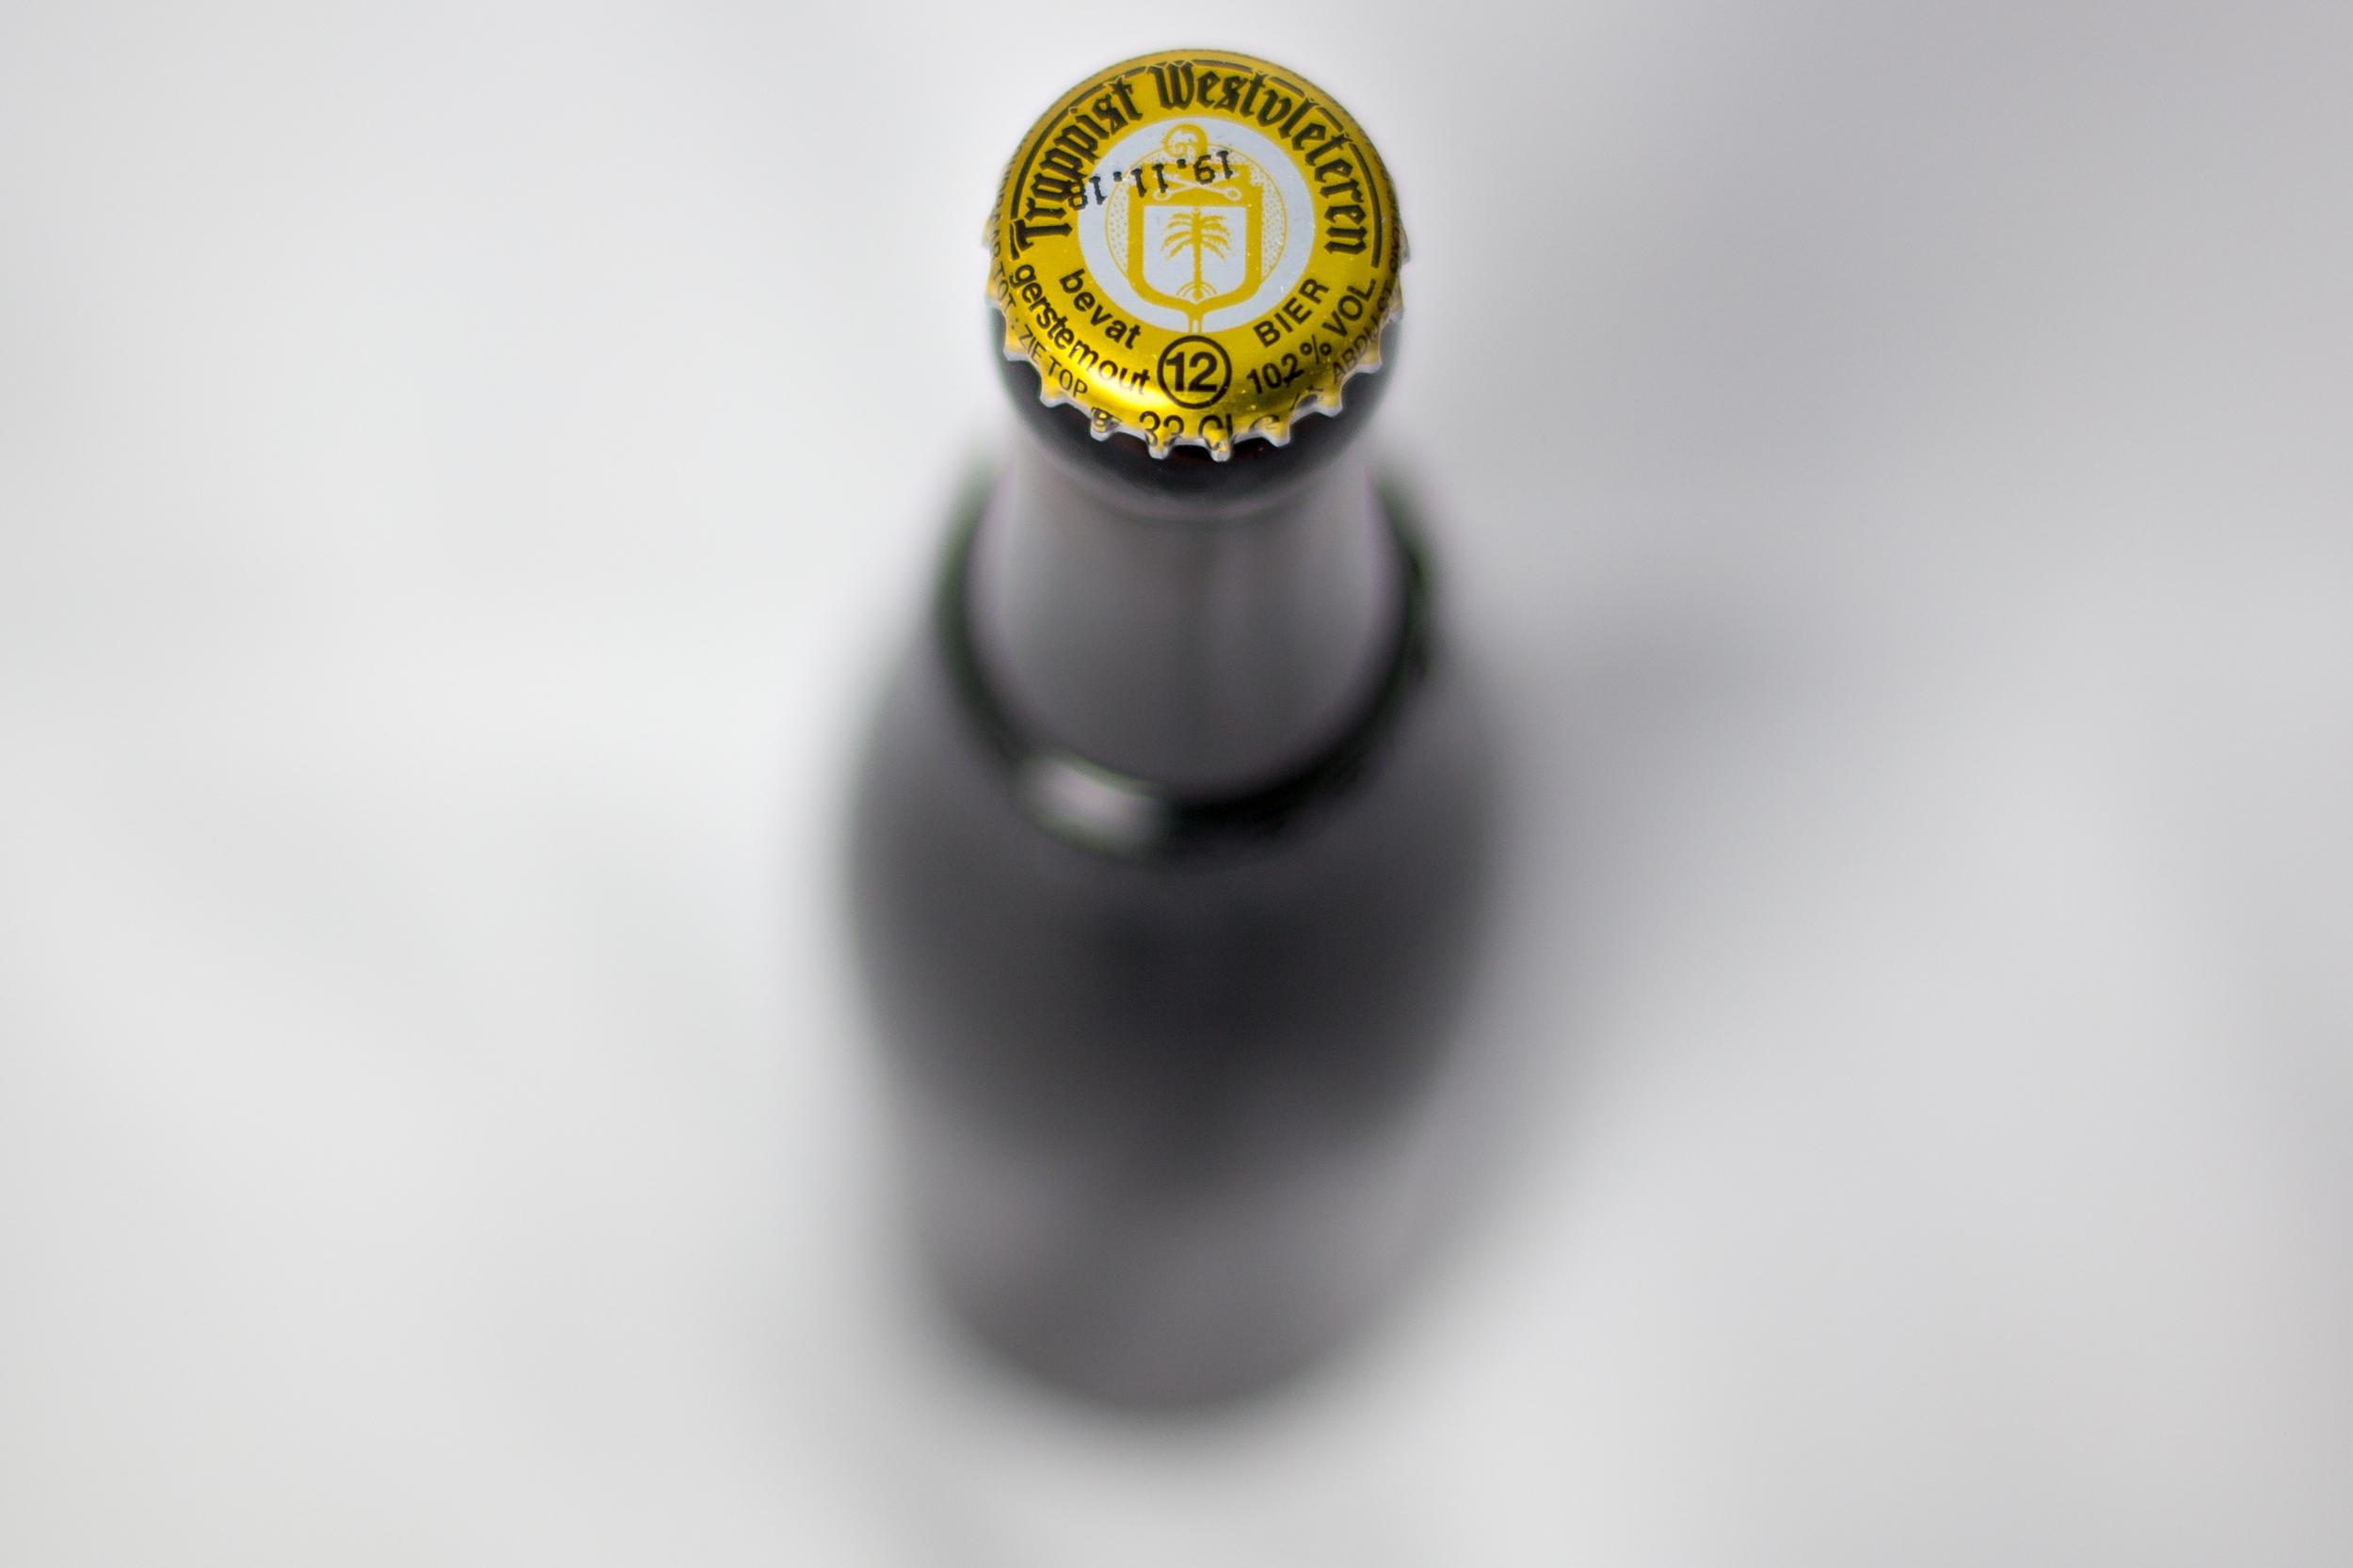 Westvletren Trappist Bier